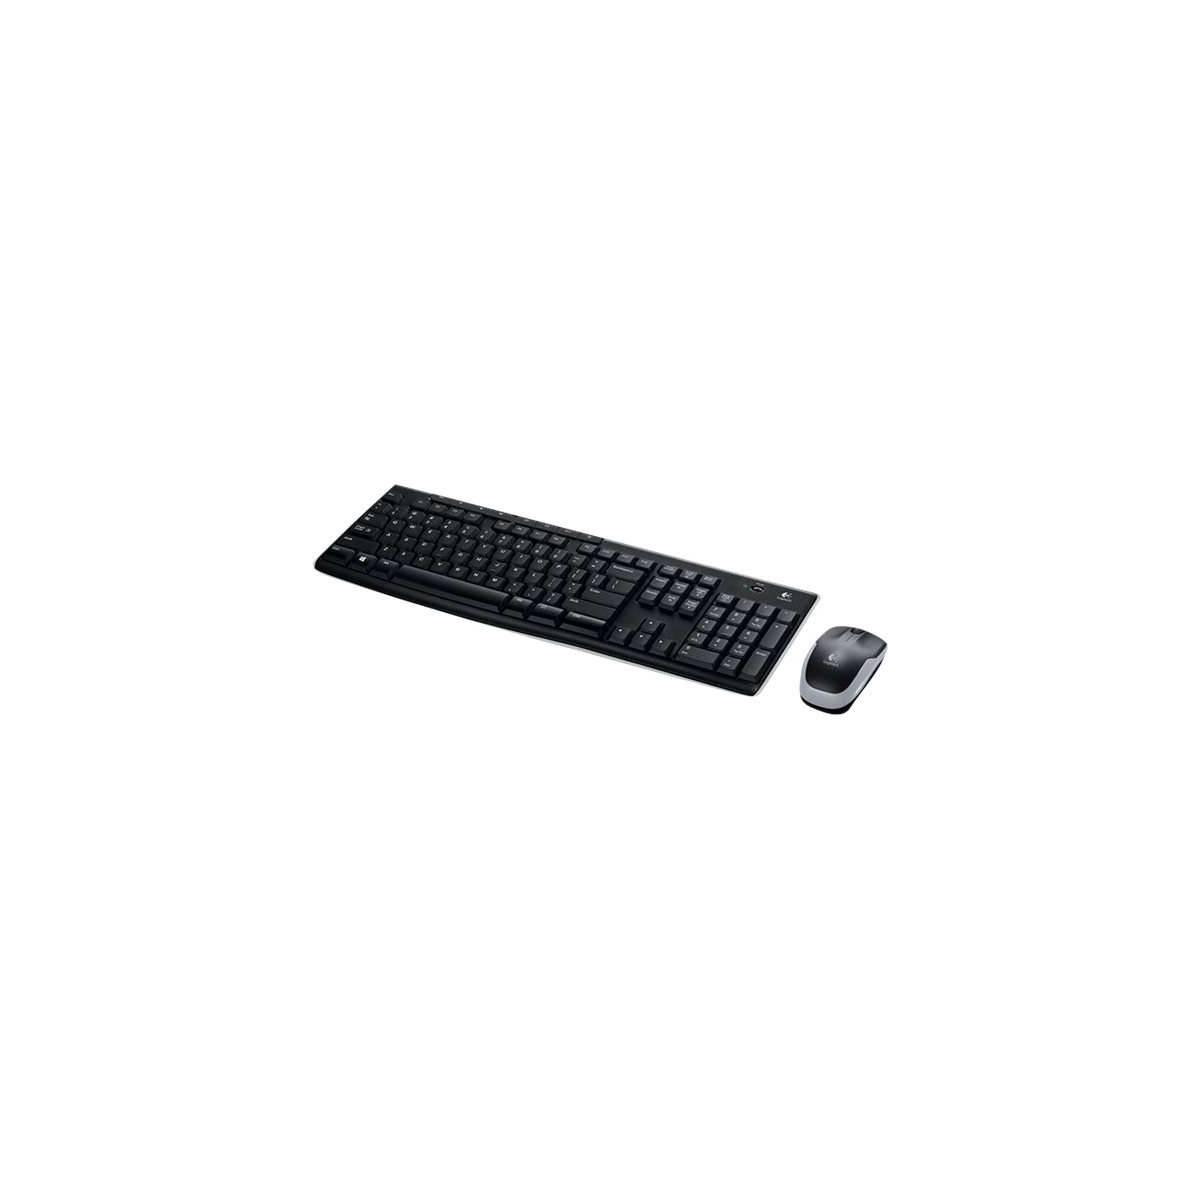 Logitech trådløs skrivebord (Mus+tastatur) MK270 (m. æøå